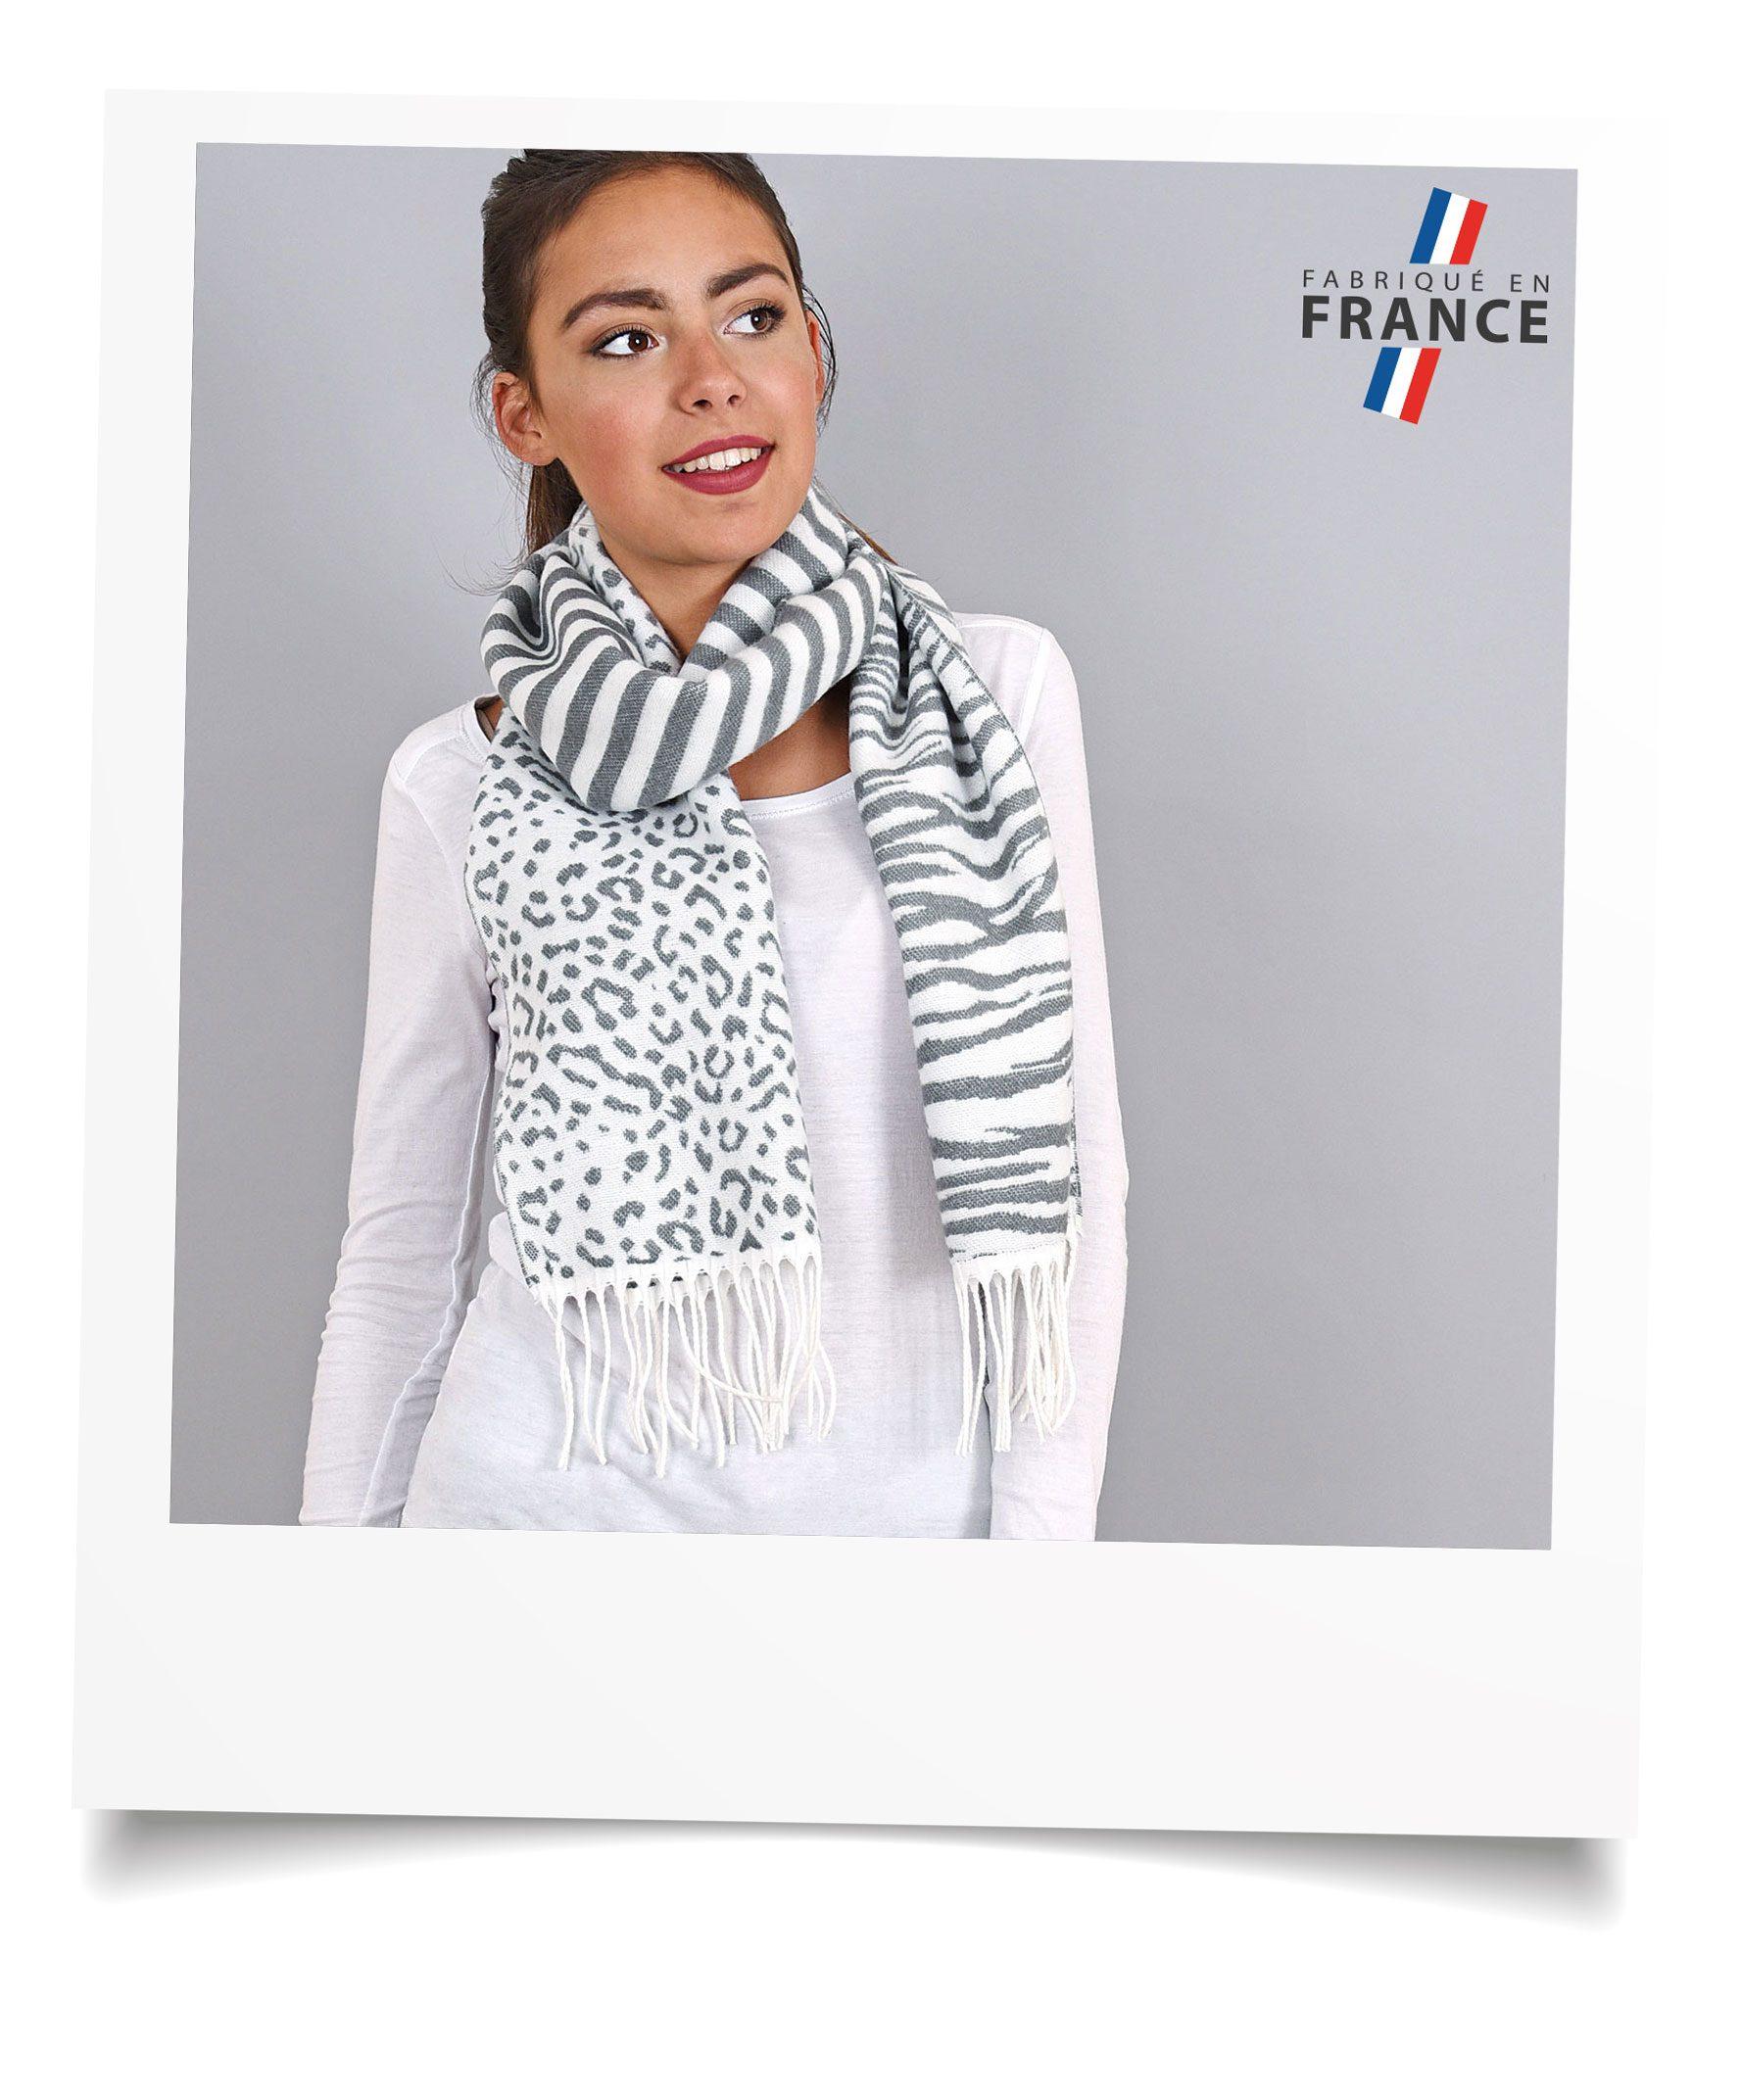 http://lookbook.allee-du-foulard.fr/wp-content/uploads/2018/09/0695-6-ADF-Accessoires-de-mode-LB-Selection_leopard-echarpe-zebre-grise-1776x2144.jpg